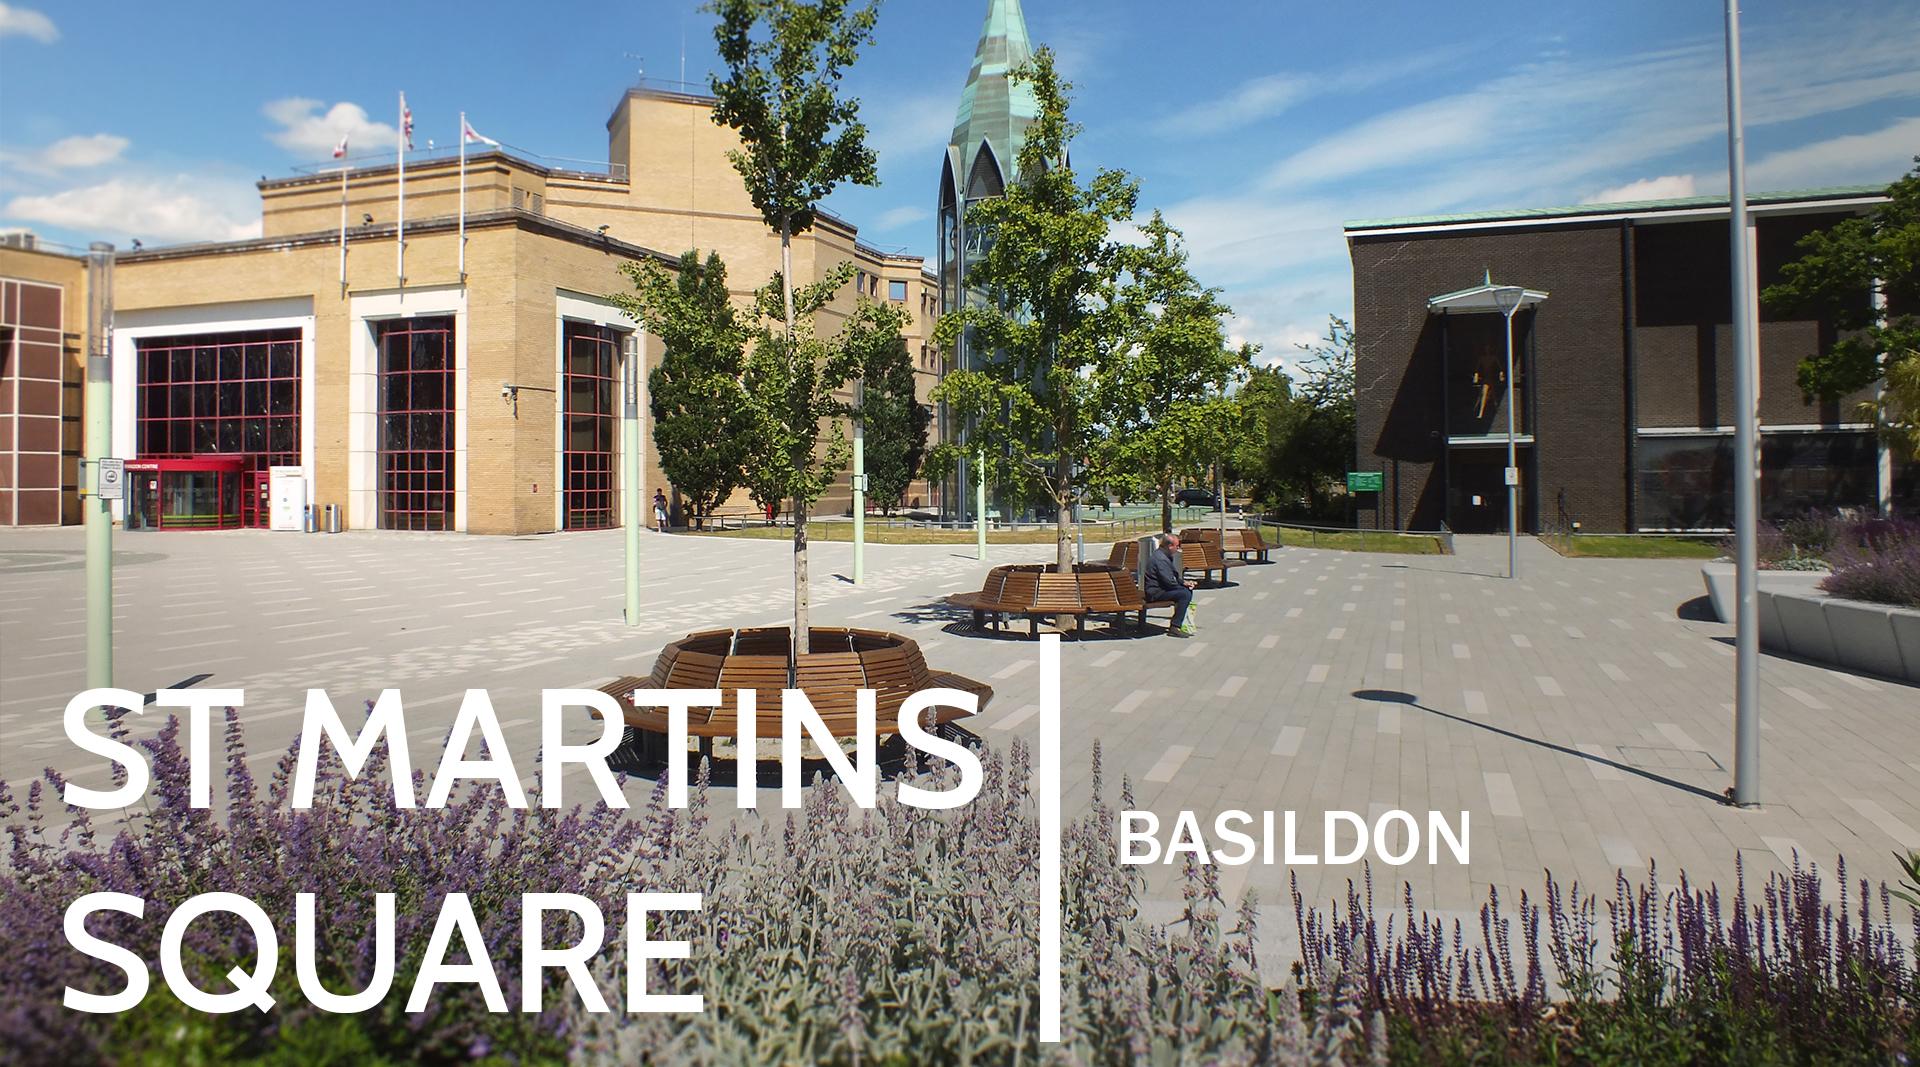 St Martins Square, Basildon